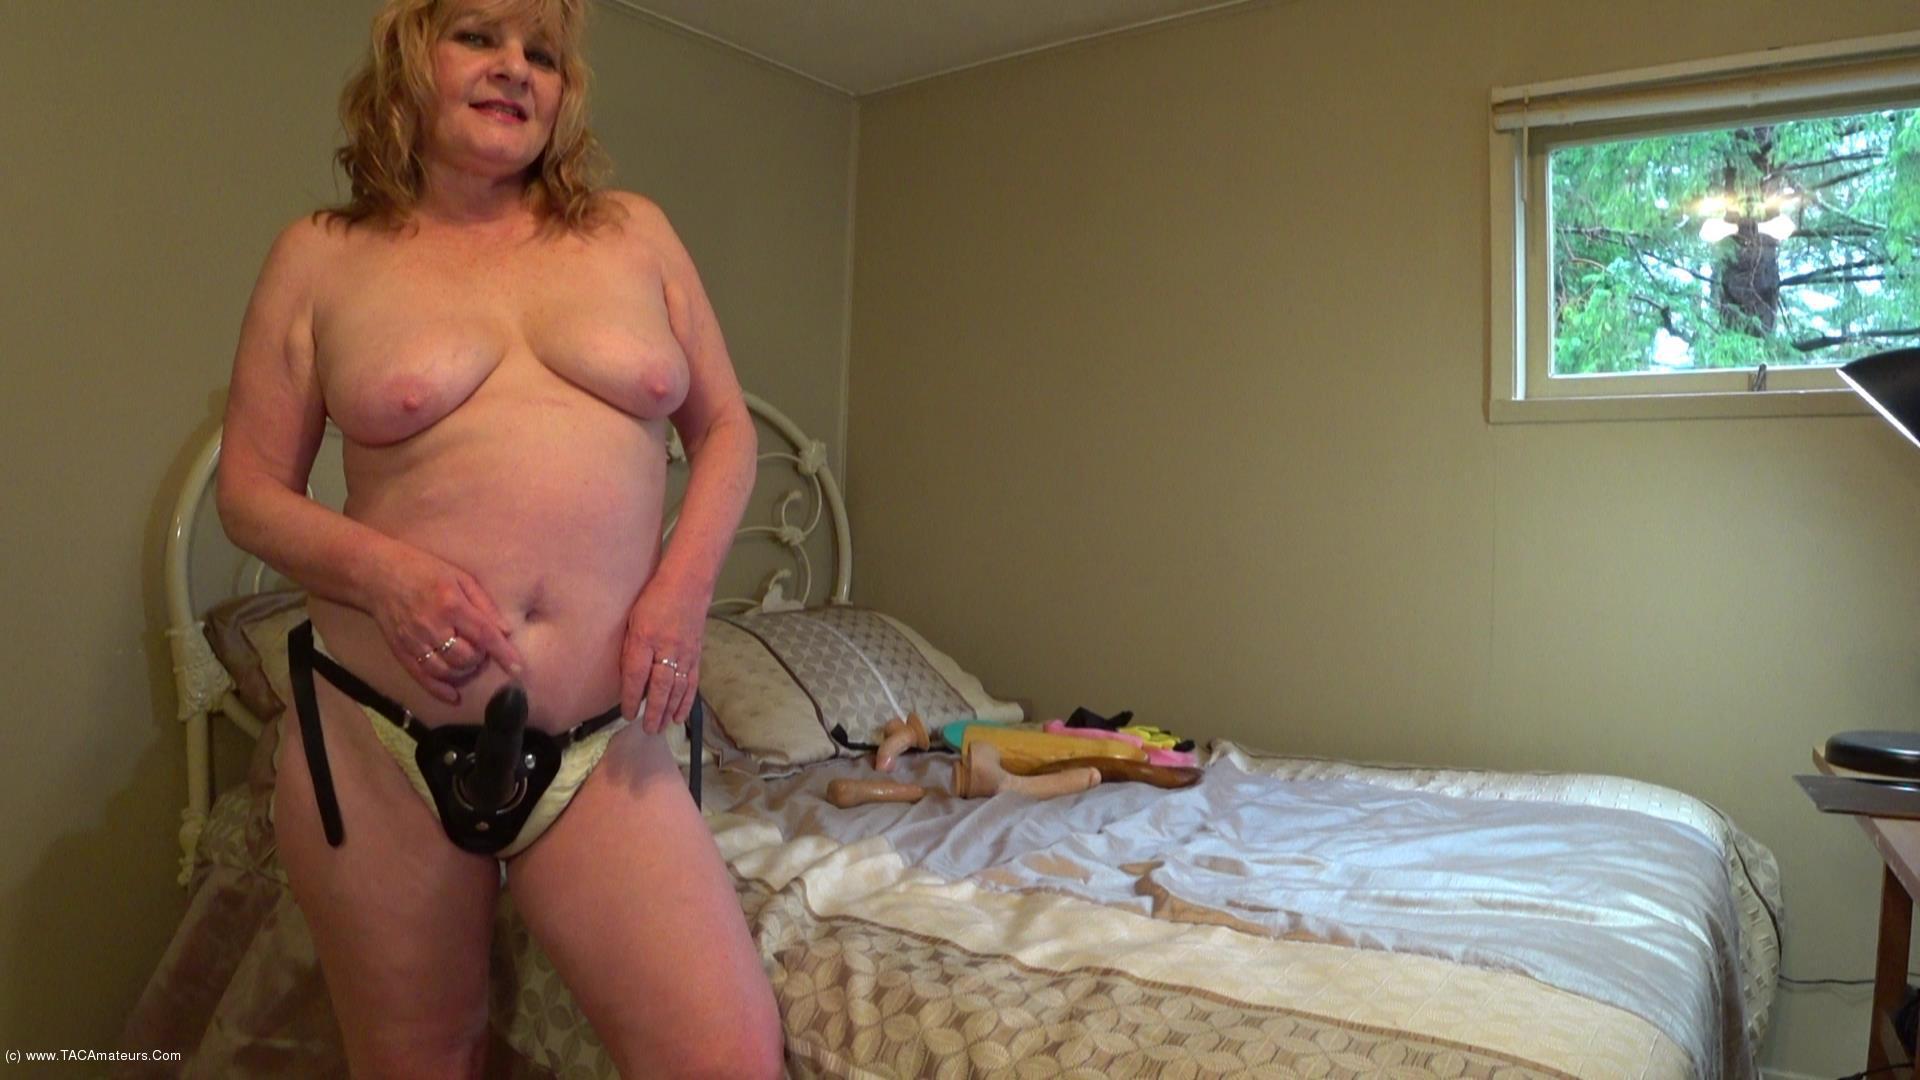 CougarBabeJolee - Sissy Boy Strap-on scene 2